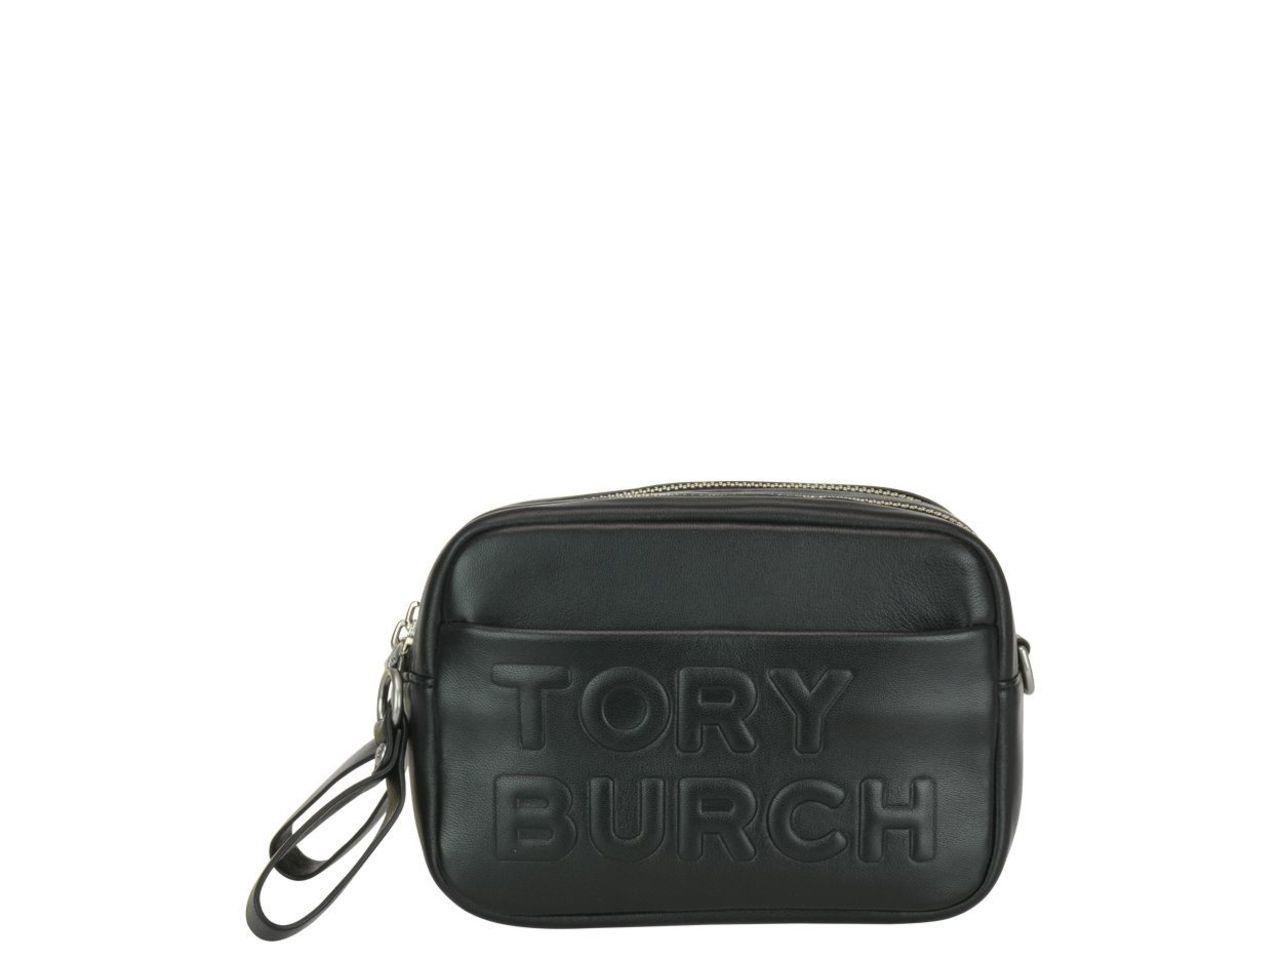 Tory Burch Perry Bag